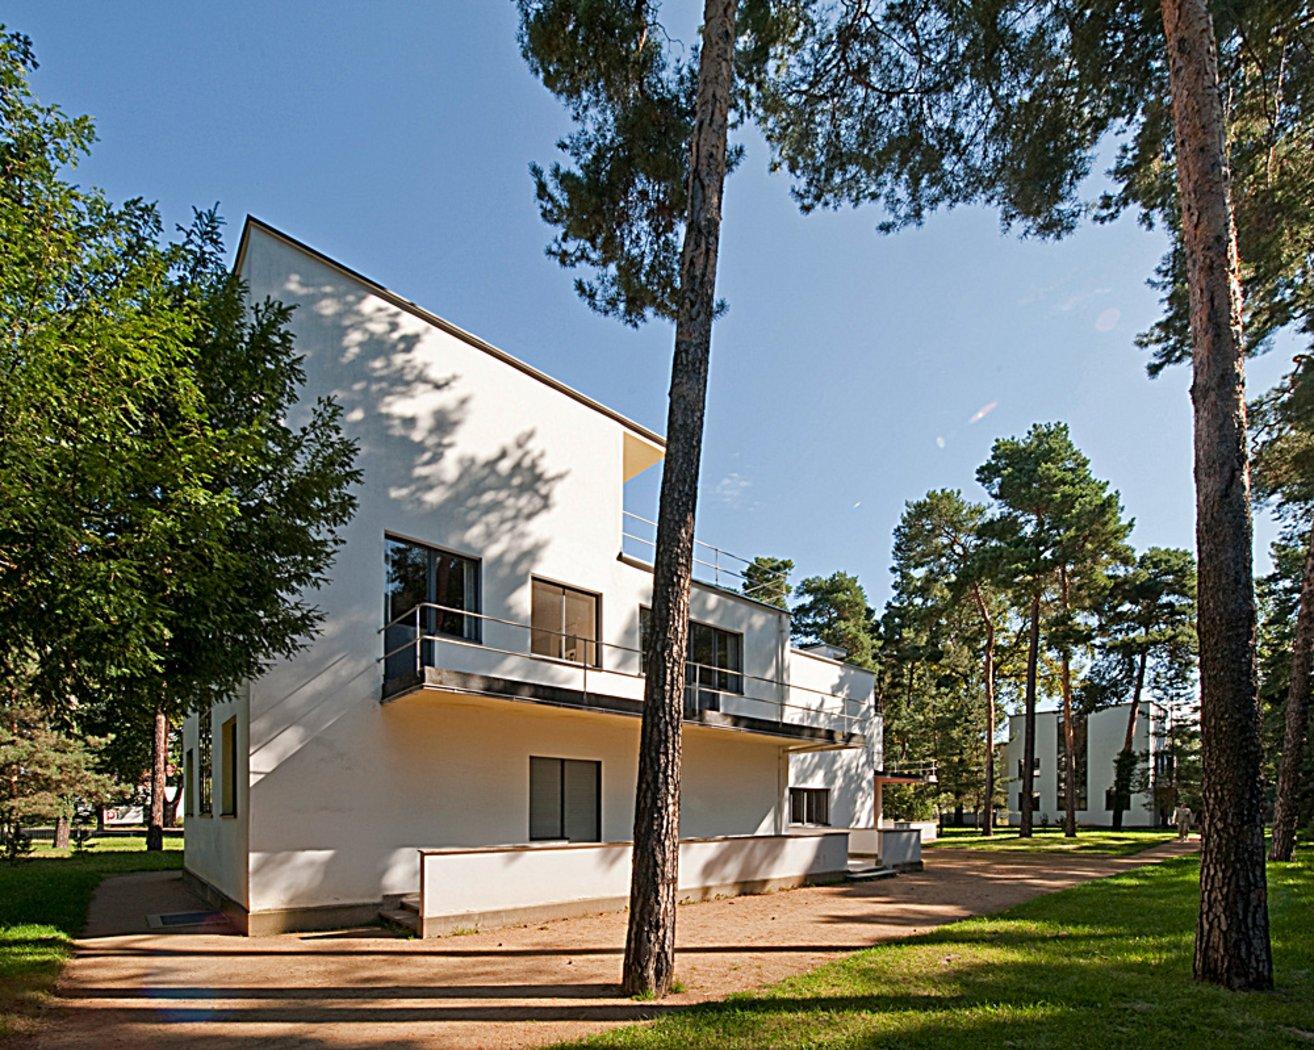 Masters Houses By Walter Gropius 1925 26 Bauhaus